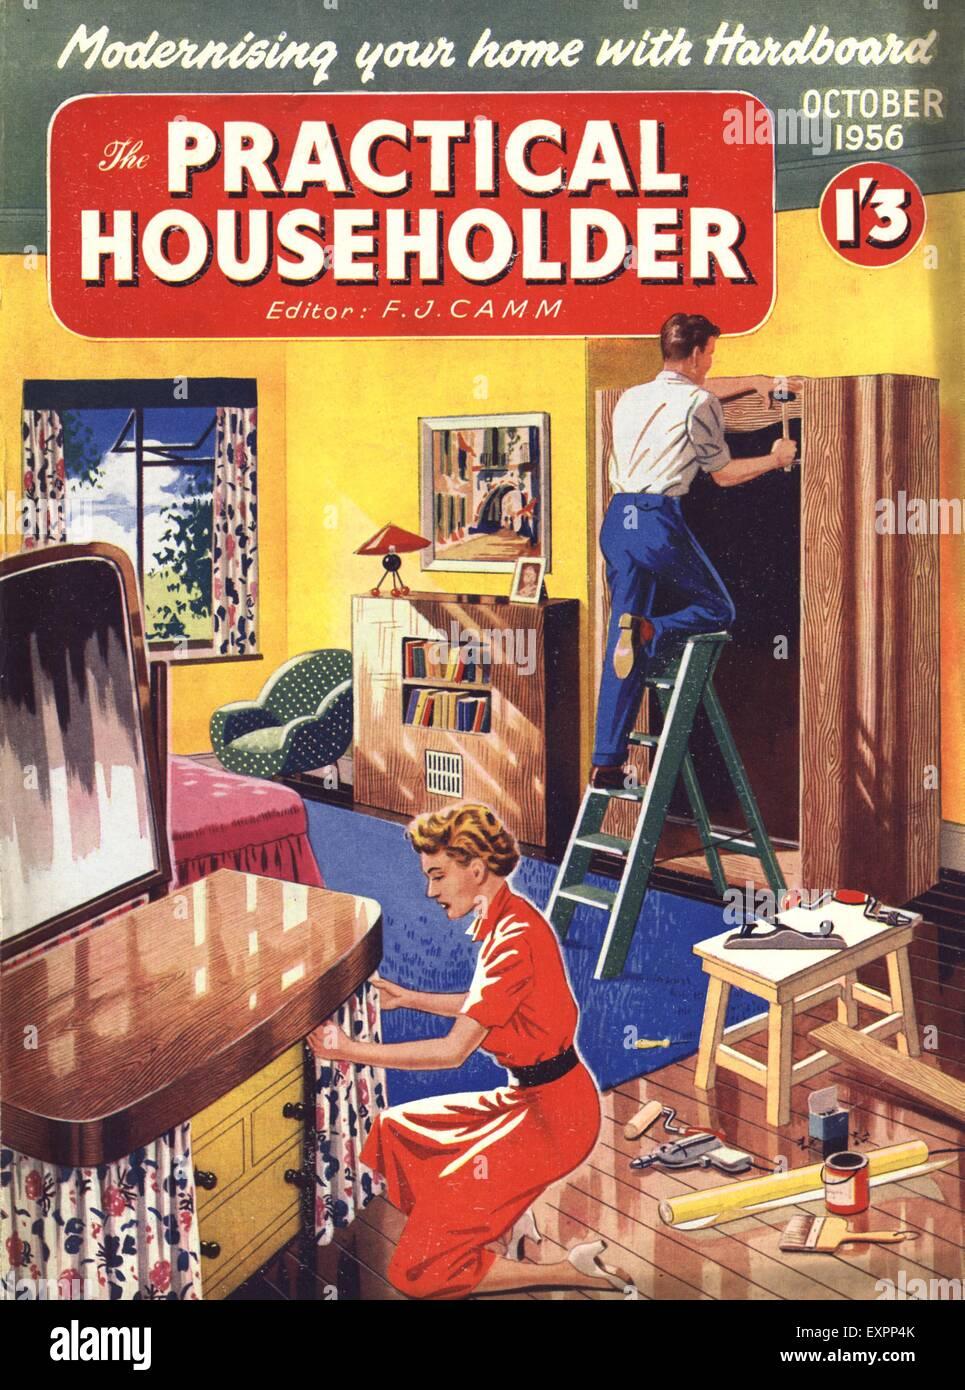 1950s Uk Practical Householder Magazine Cover Stock Photo 85322851